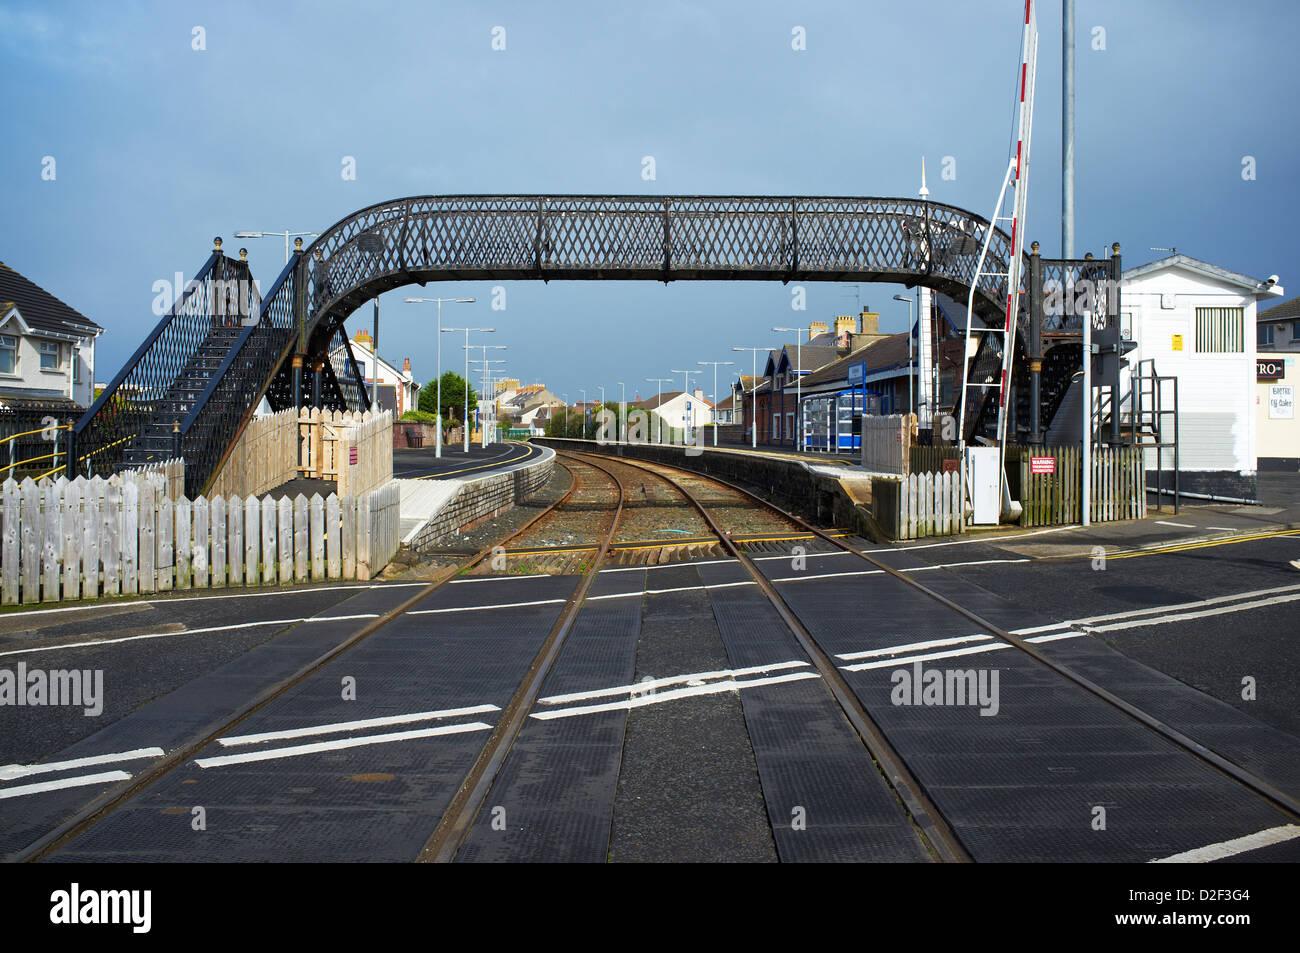 Level crossing at Castlerock train station and passenger footbridge - Stock Image